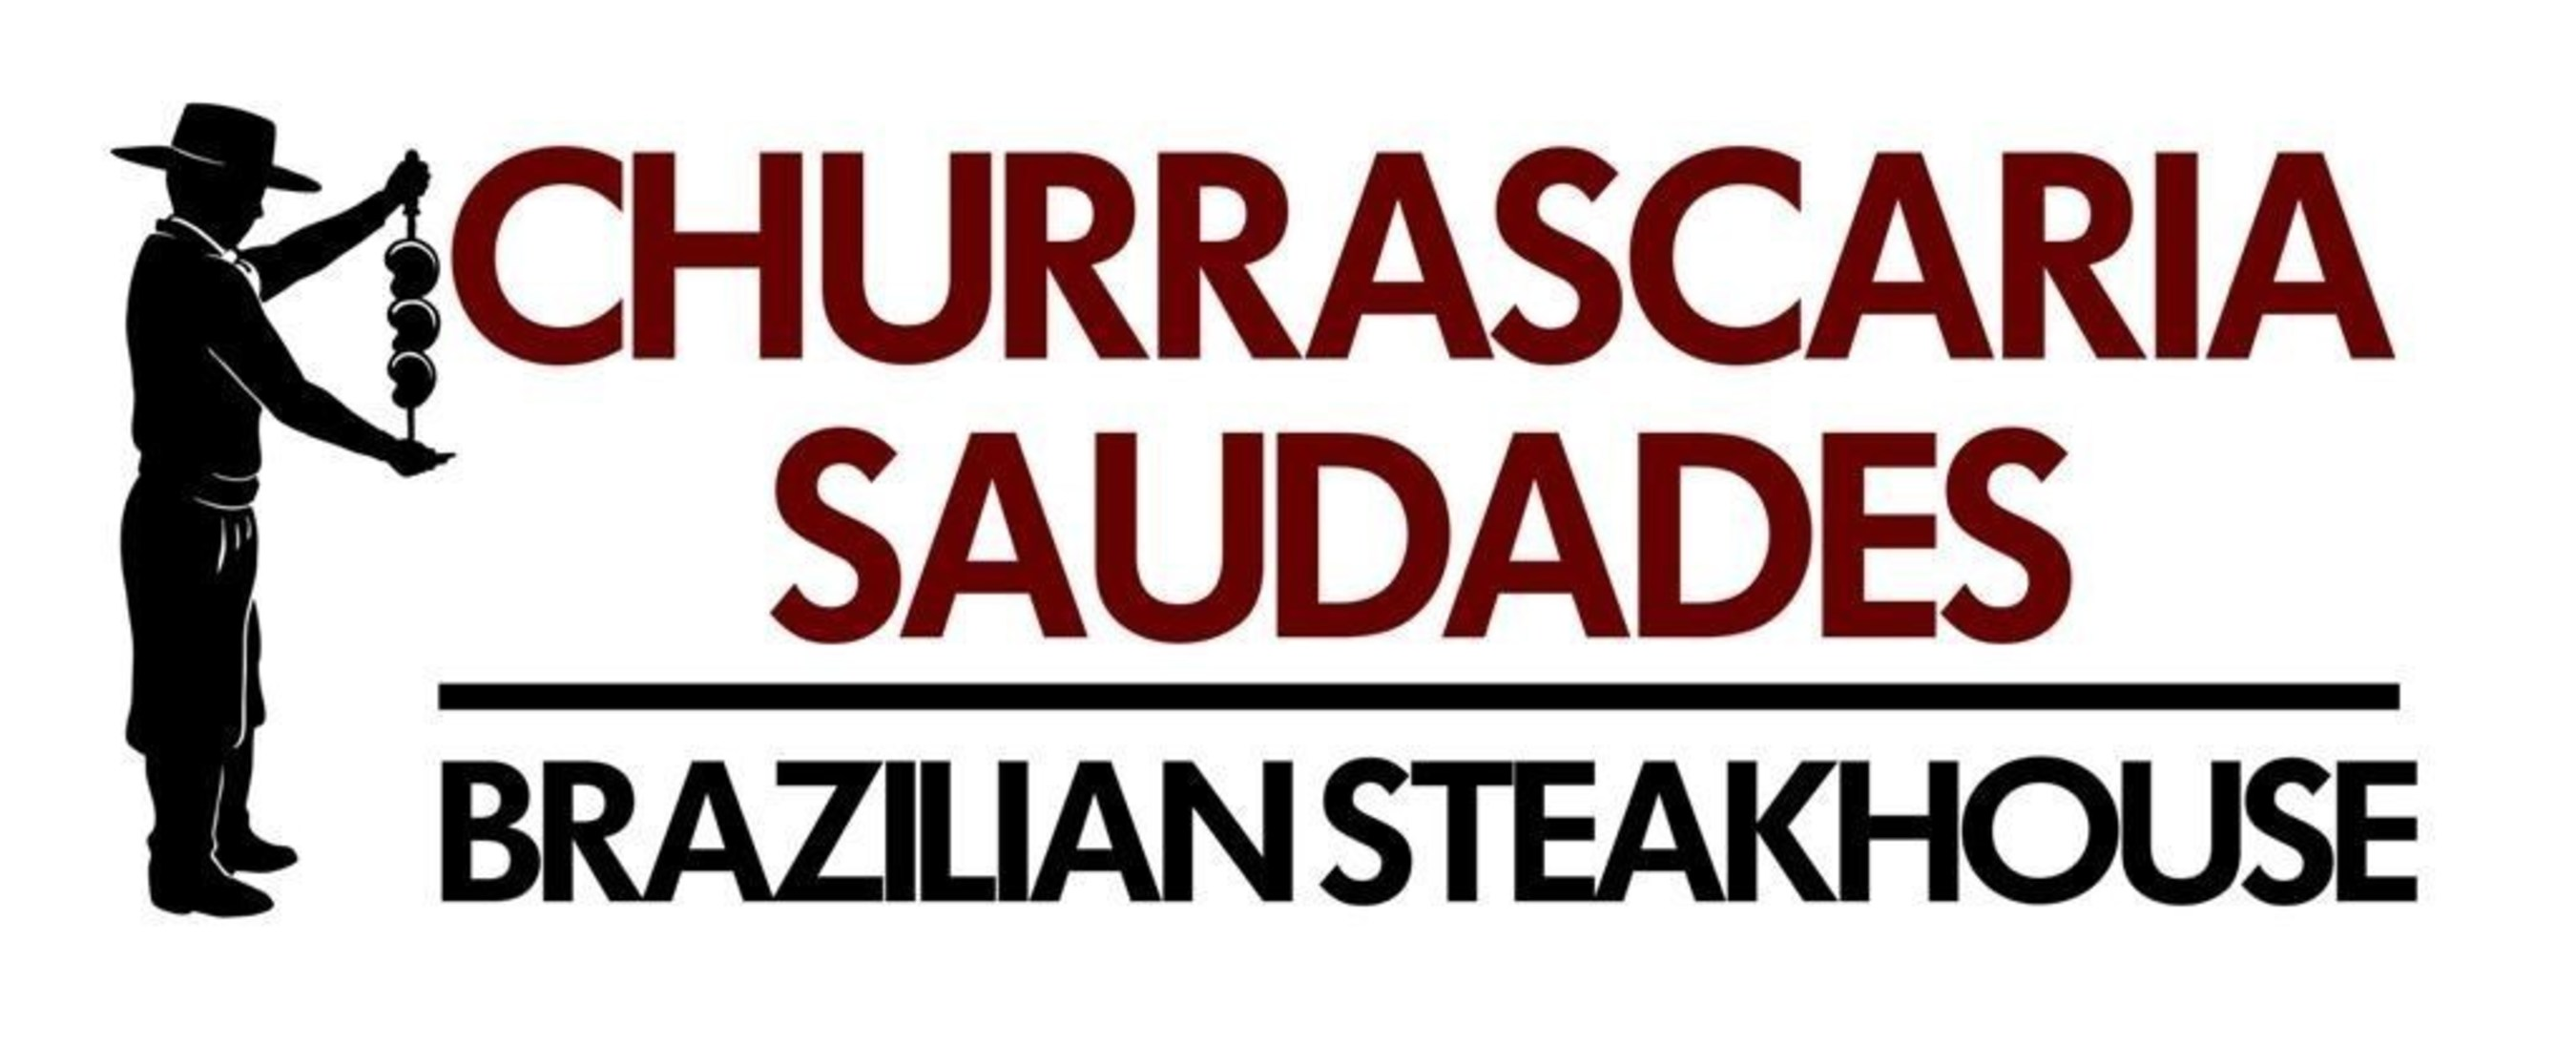 Churrascaria Saudades - Brazilian Steakhouse Announces Opening